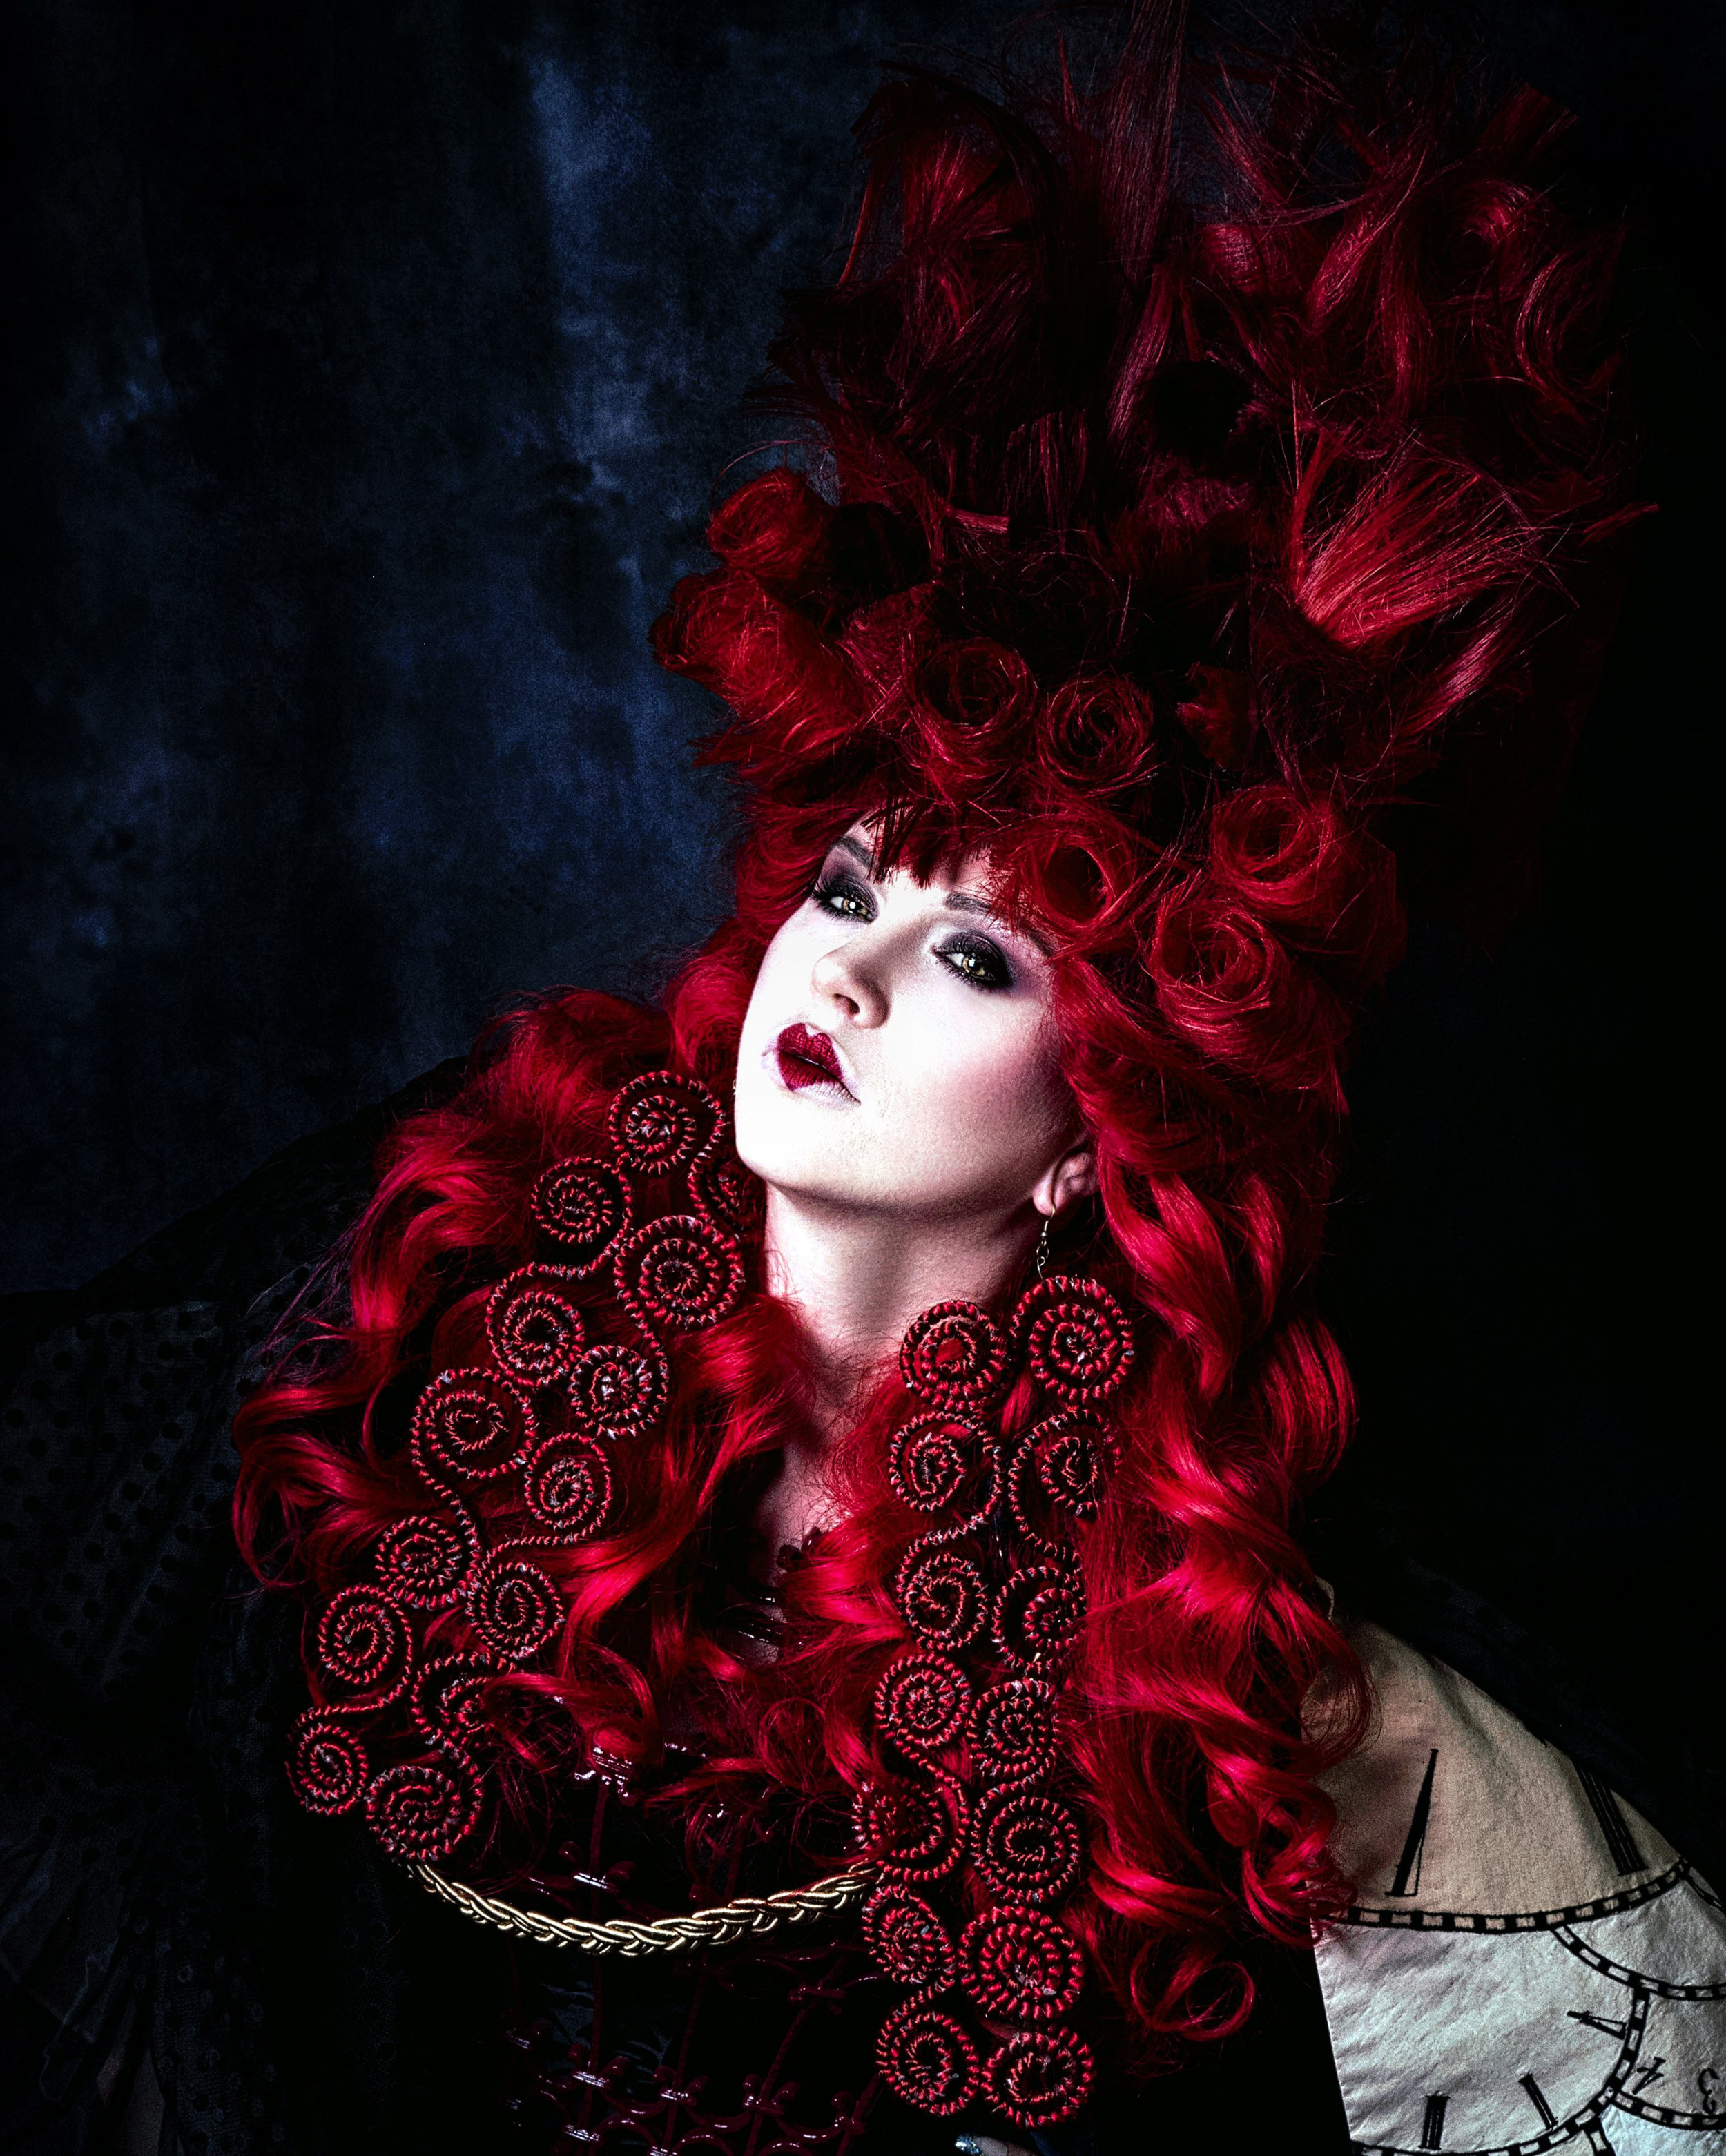 image by Genna Yussman Greene/ Absolute Studio